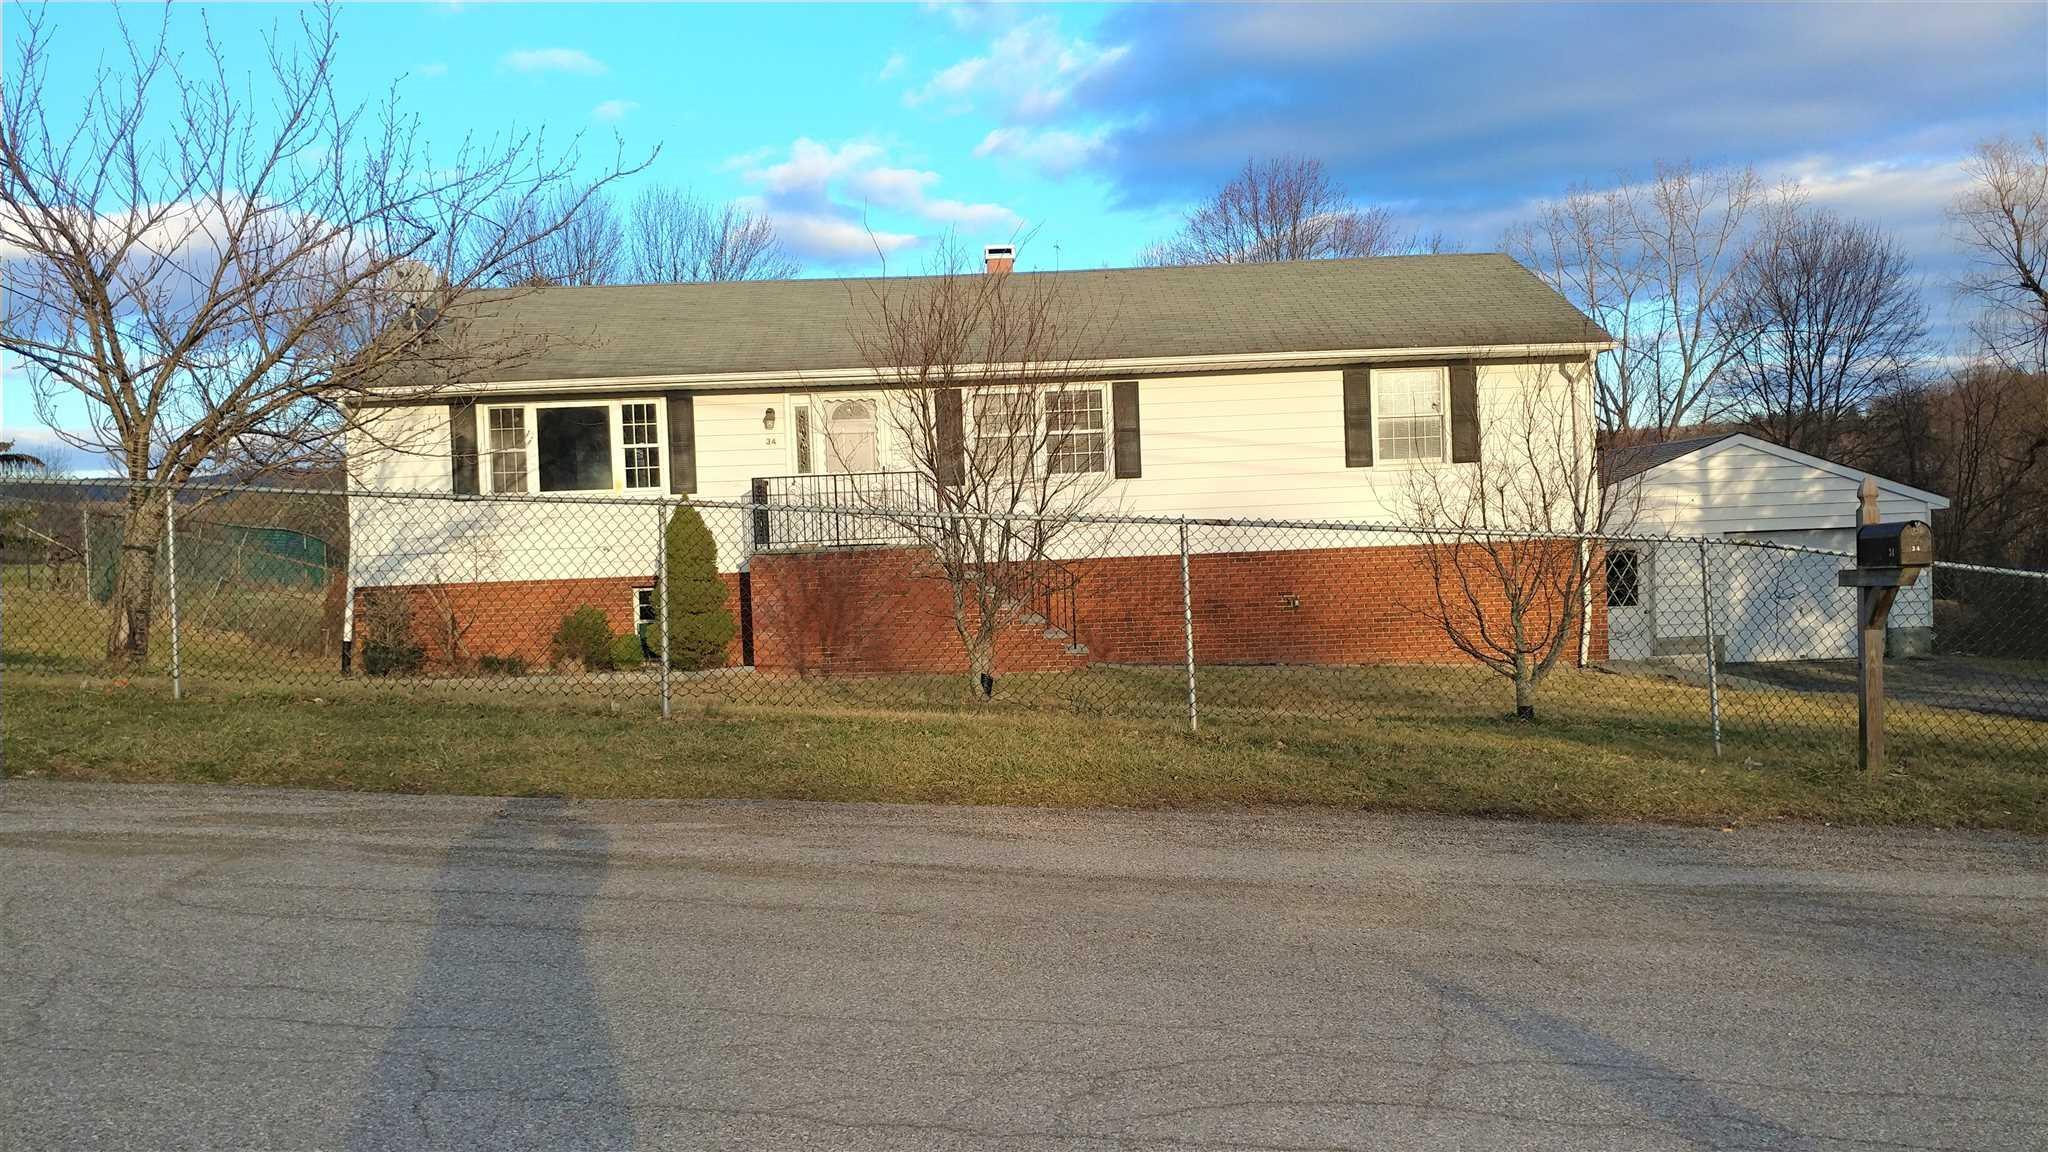 34 JOHNSON RD, La Grange, NY 12540